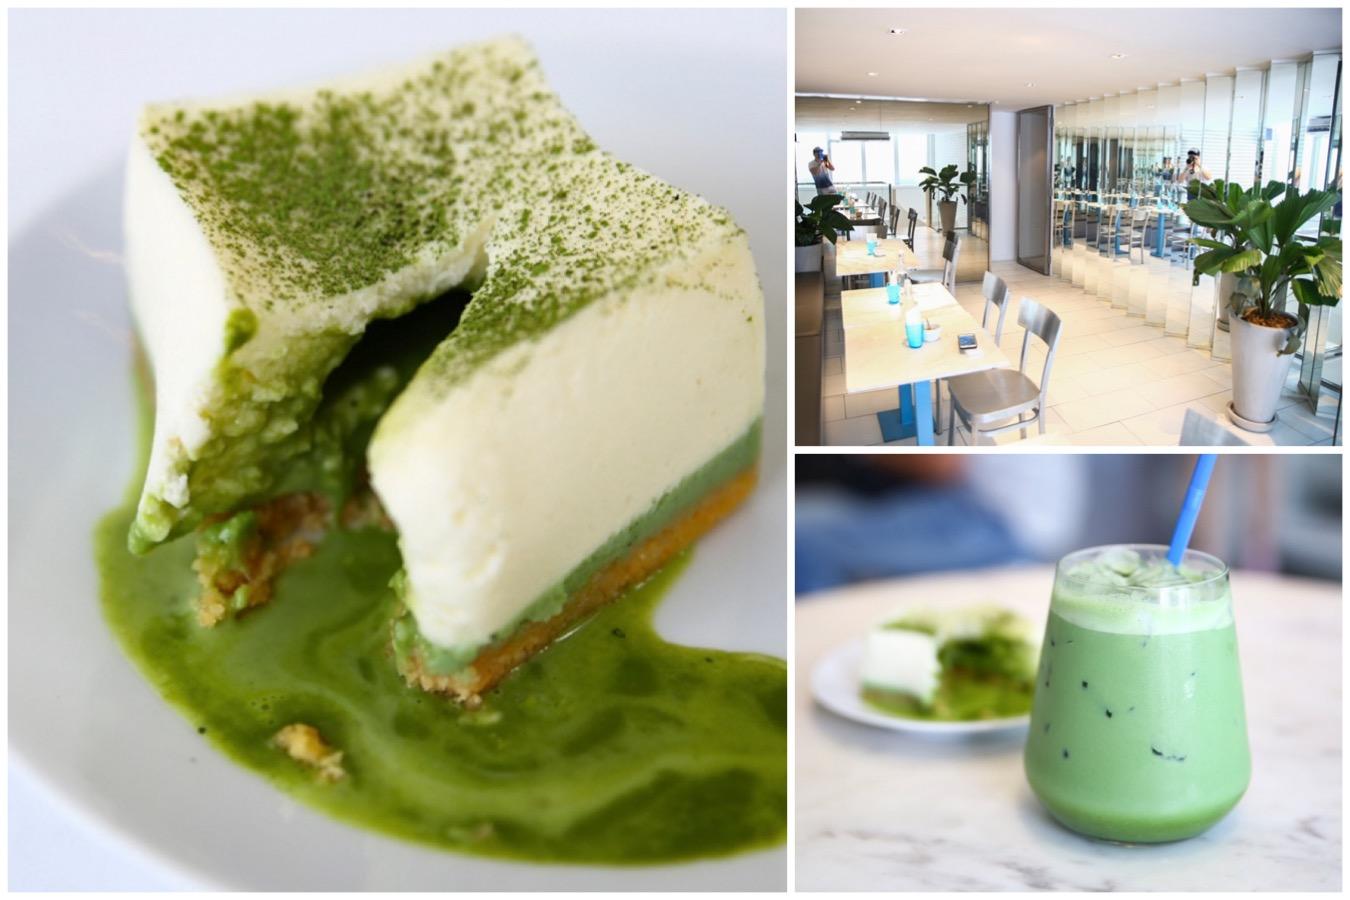 Kaizen Coffee Co. - All White Interior, With Good Coffee And Matcha Lava Cheesecake. At Ekkamai Bangkok